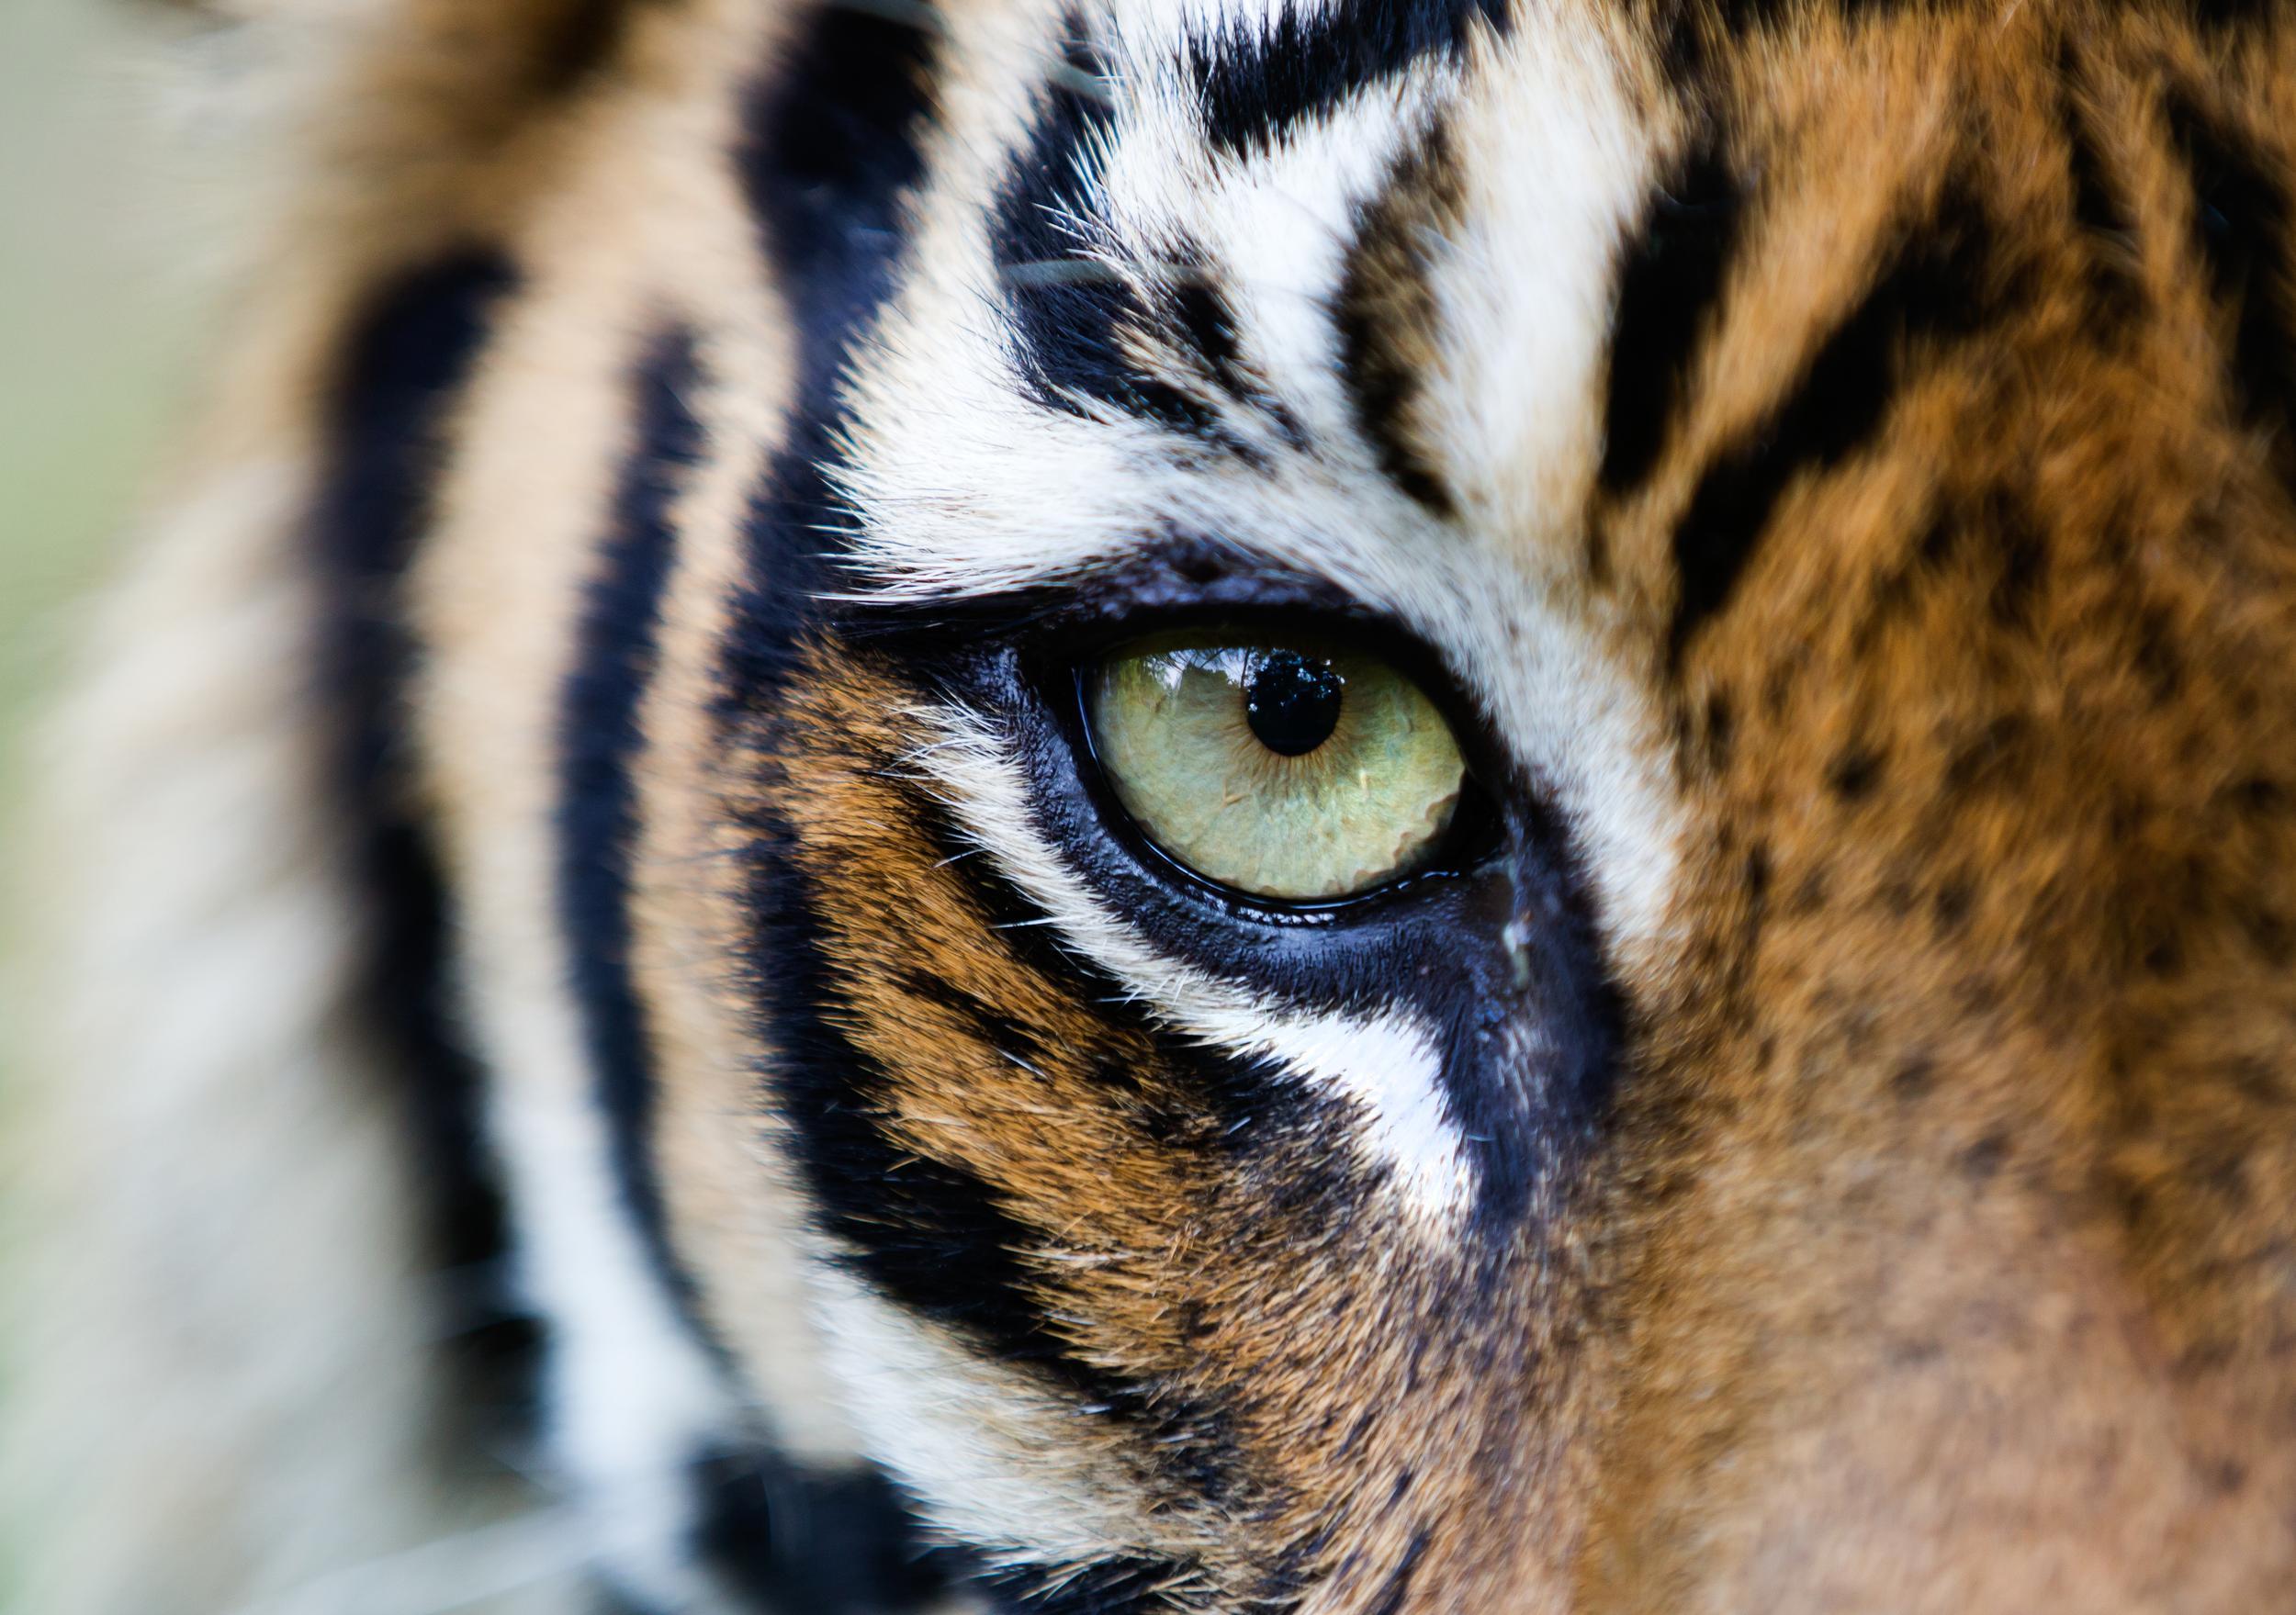 Closeup of a tiger's eye